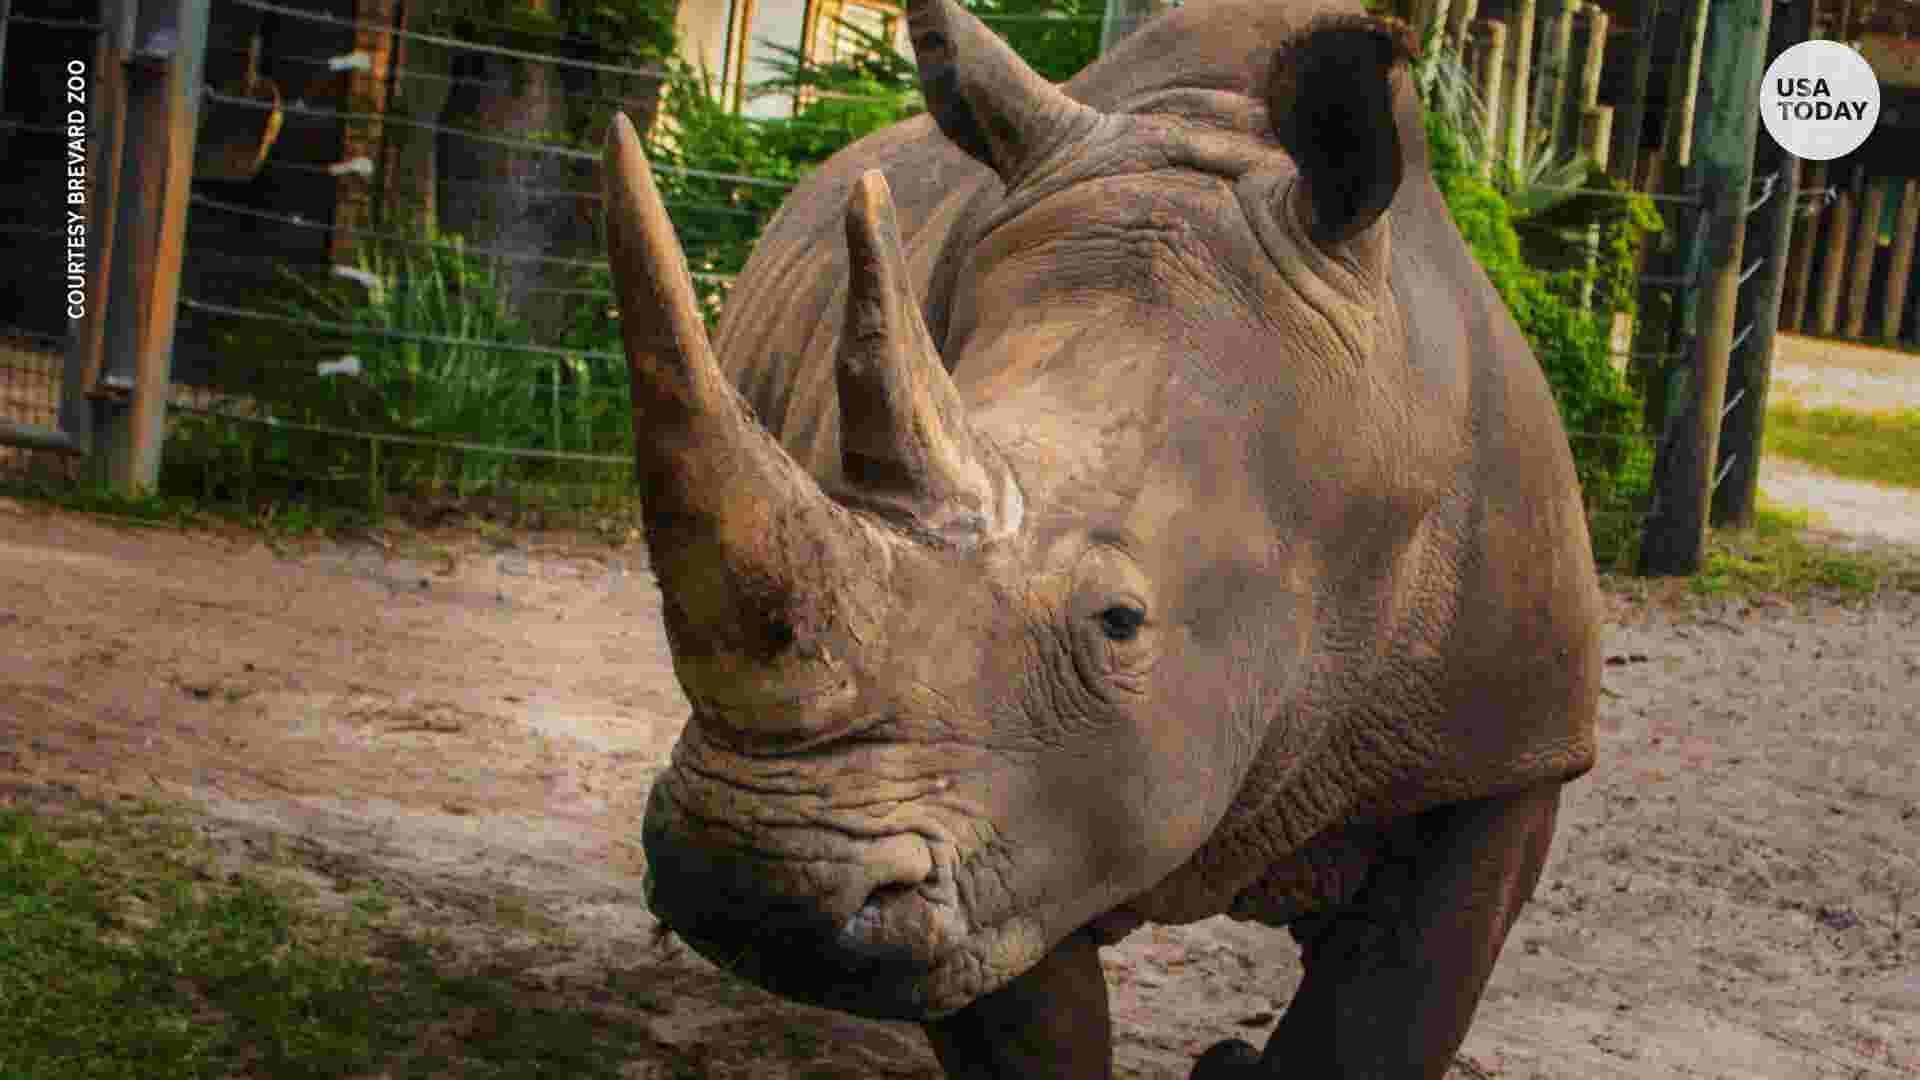 Toddler stumbles into rhino enclosure at Florida zoo